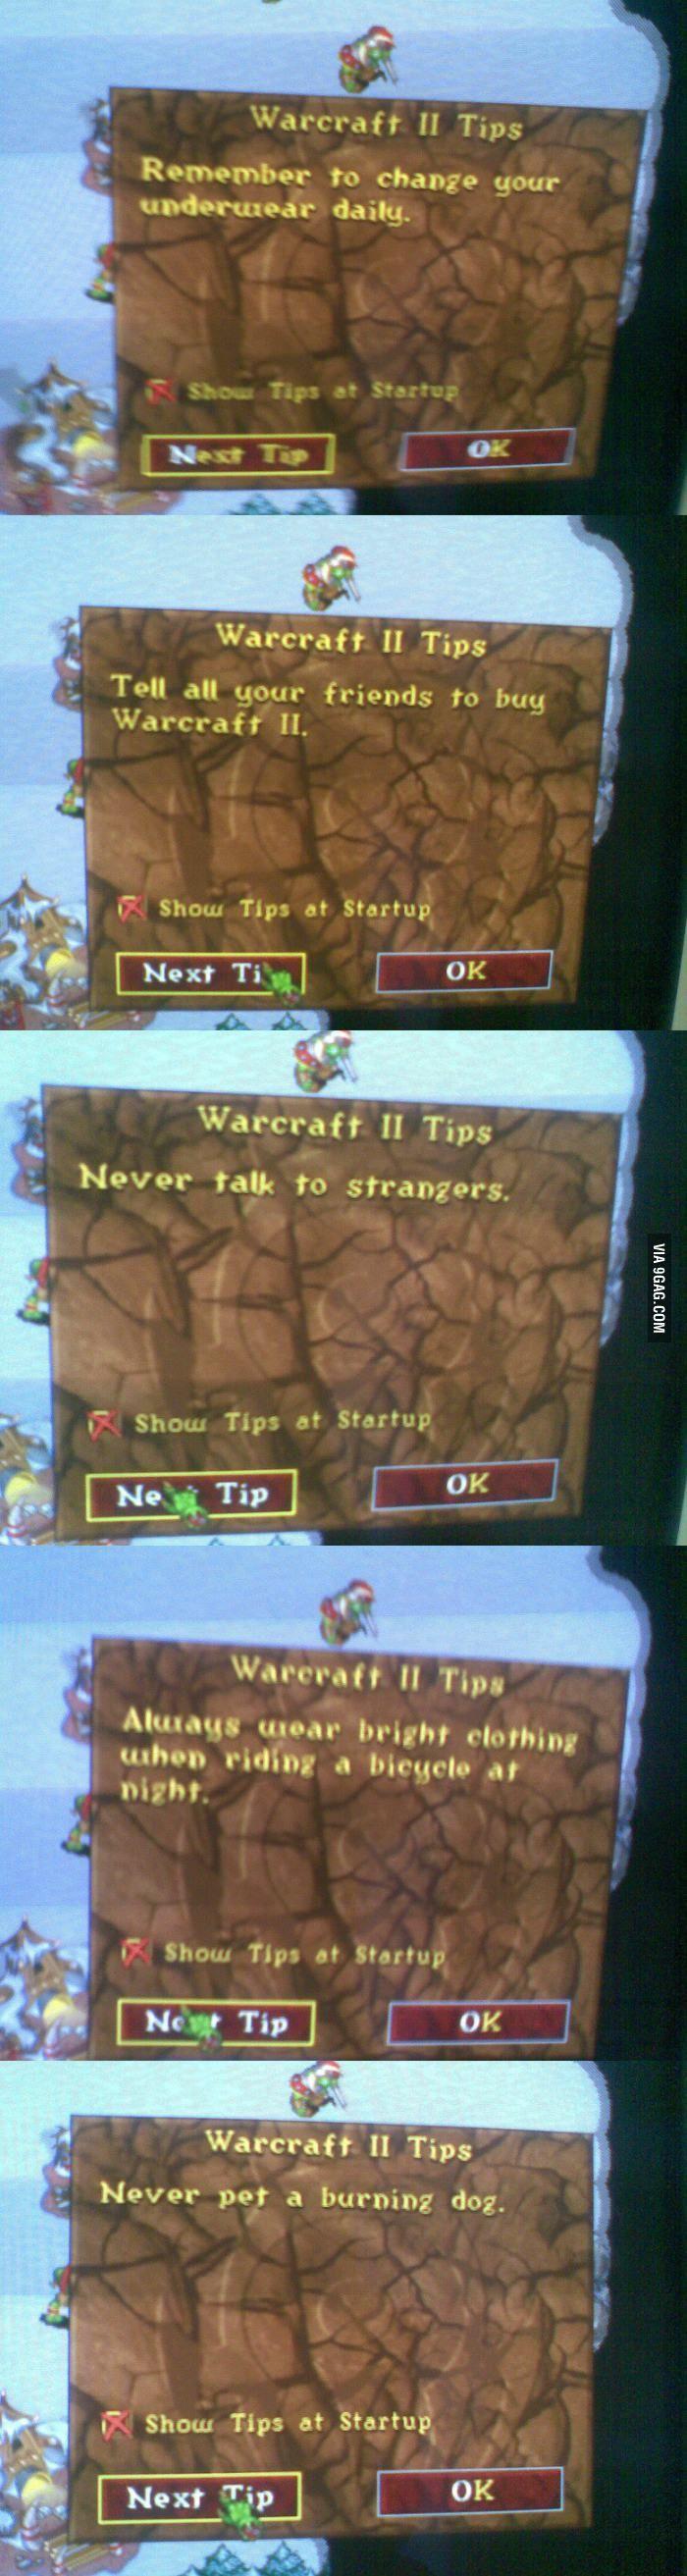 Warcraft II Tips - 9GAG